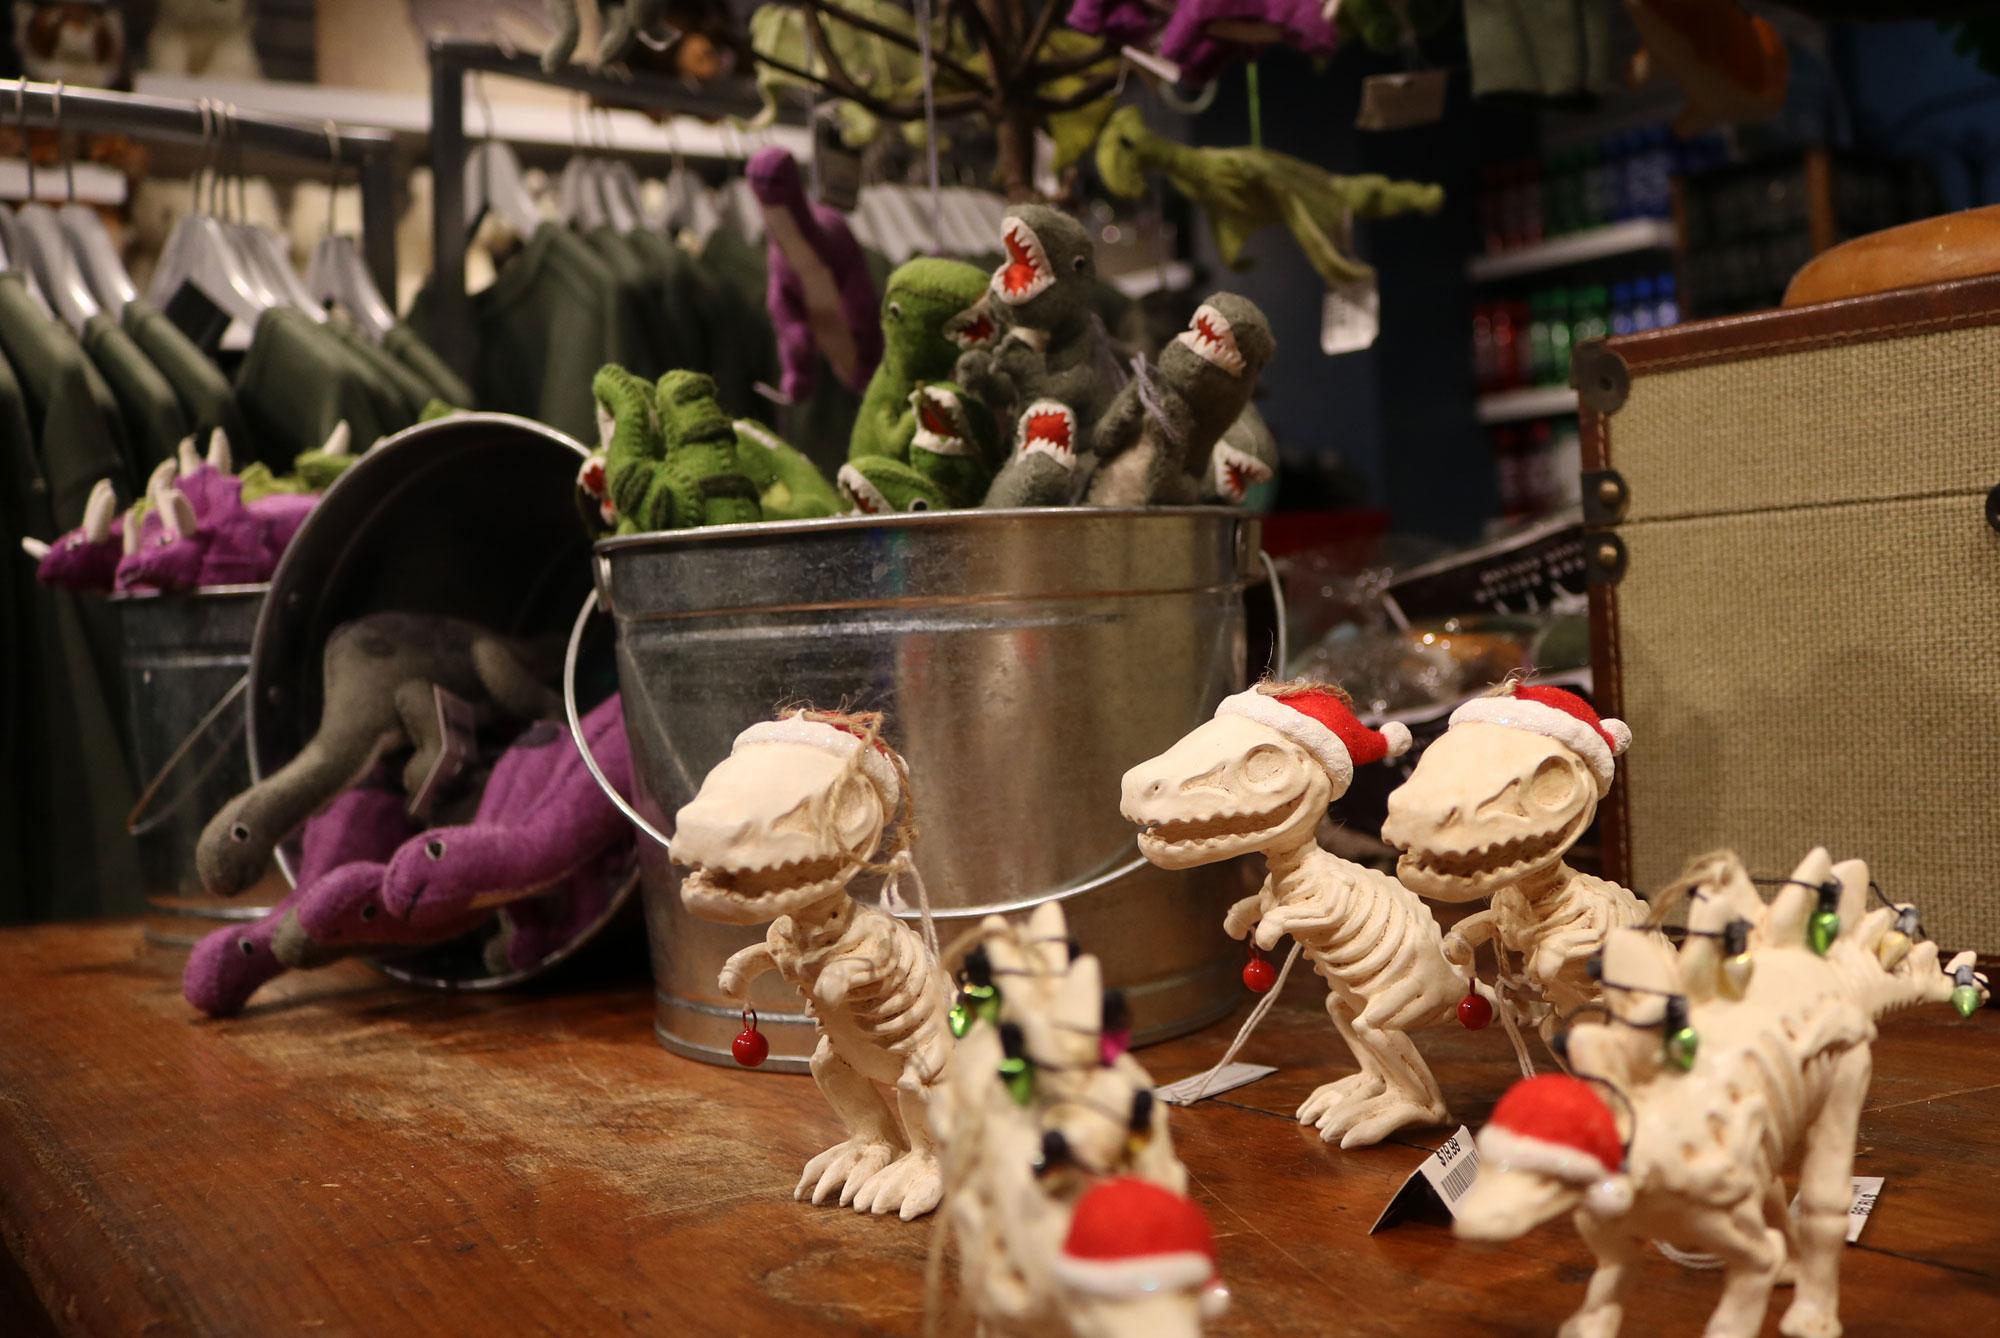 Dinosaur Christmas tree ornaments, skeletons with Santa hat